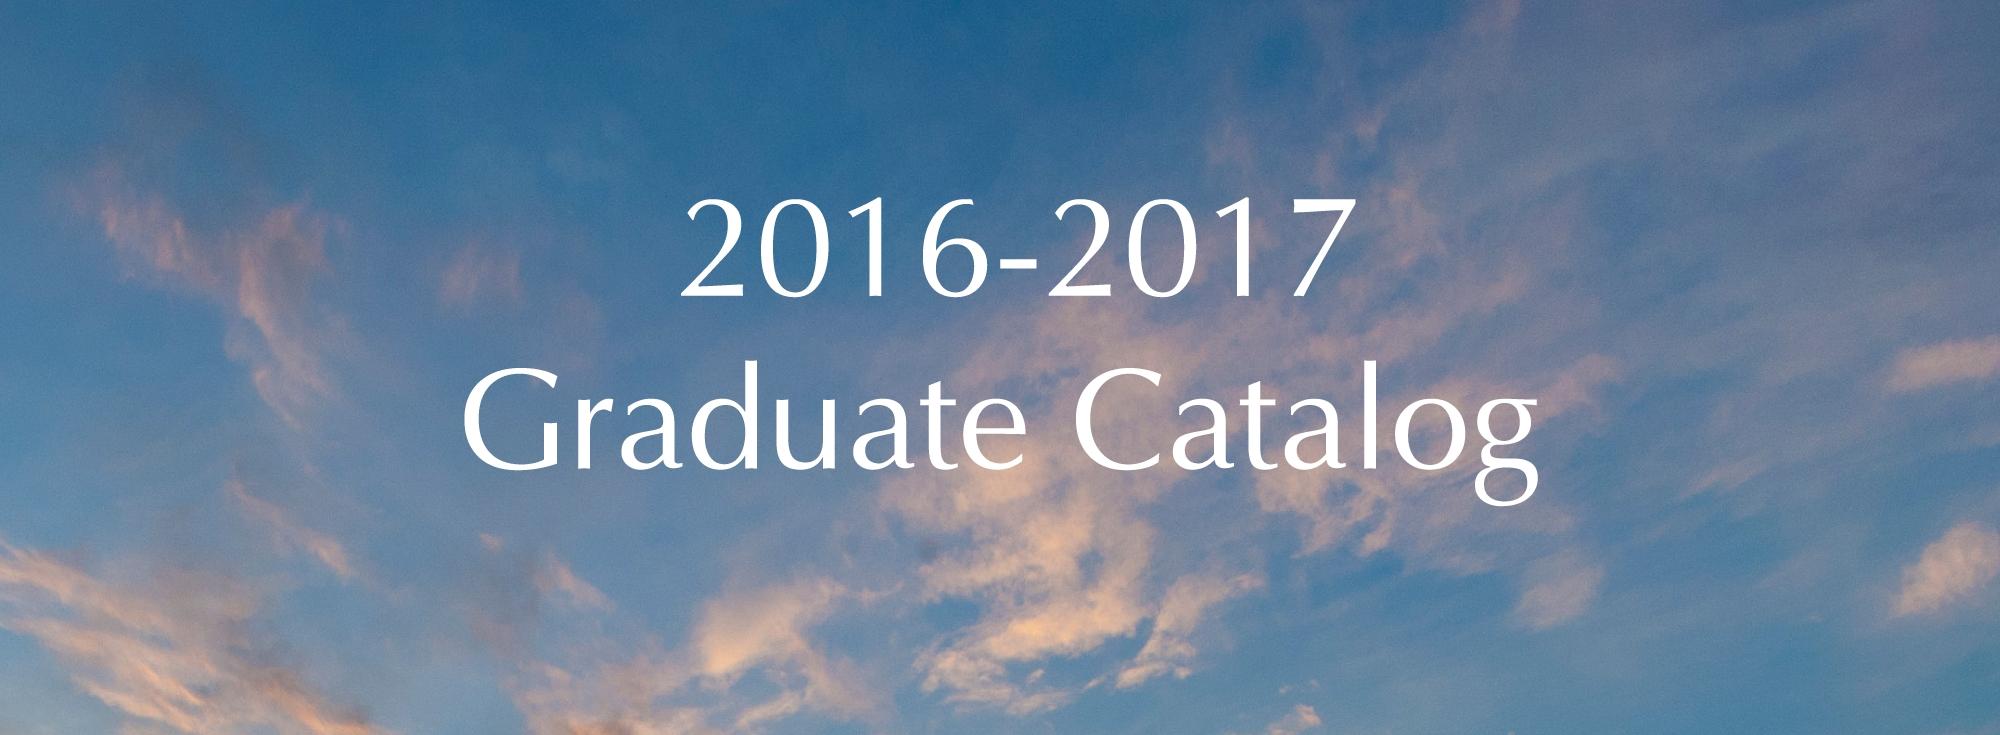 Academic Calendar | The Graduate School Calendar 2019 Uconn